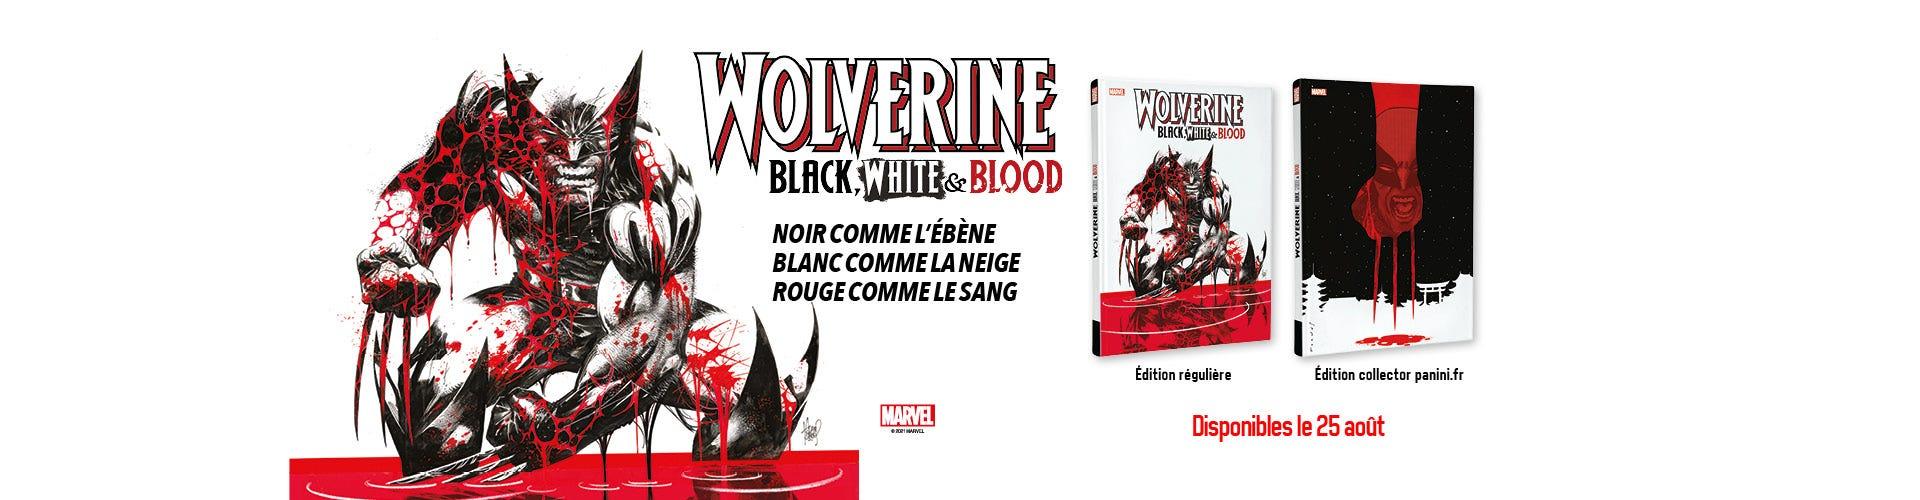 1920x500_Site_PaniniFR_Wolverine_BlackWhiteBlood_2